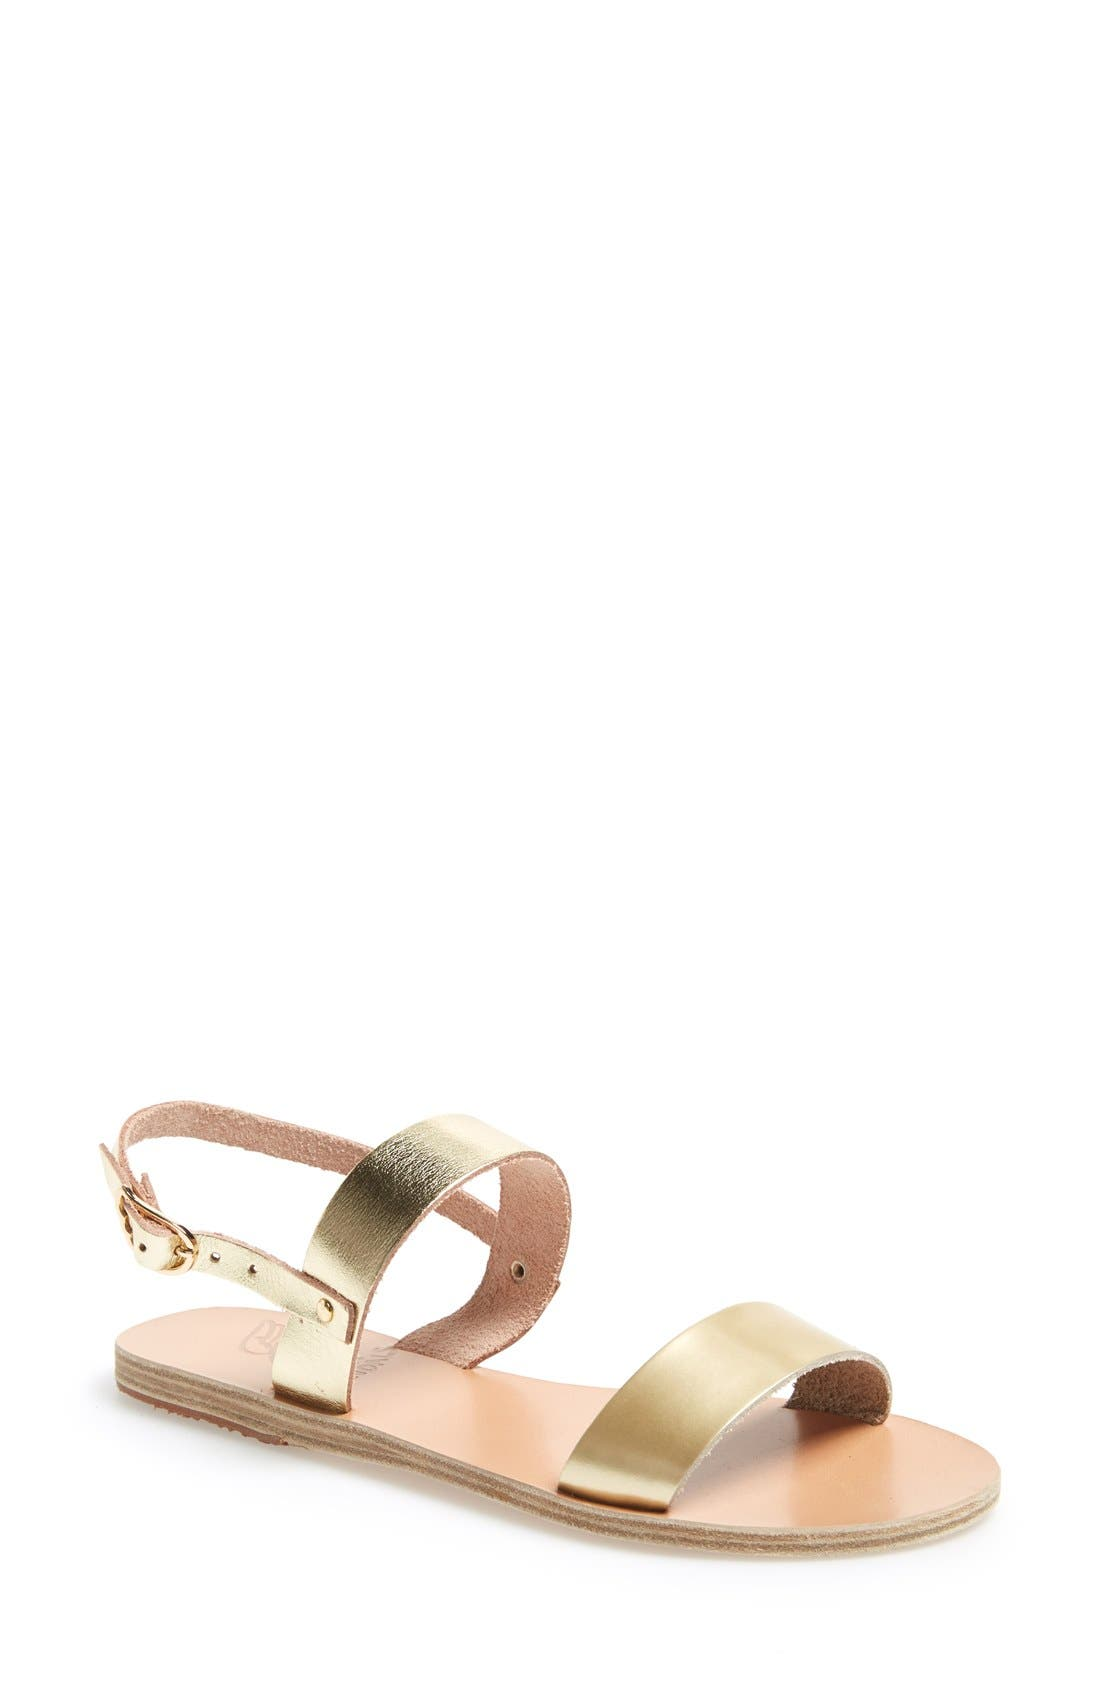 Main Image - Ancient Greek Sandals 'Clio' Leather Sandal (Women)